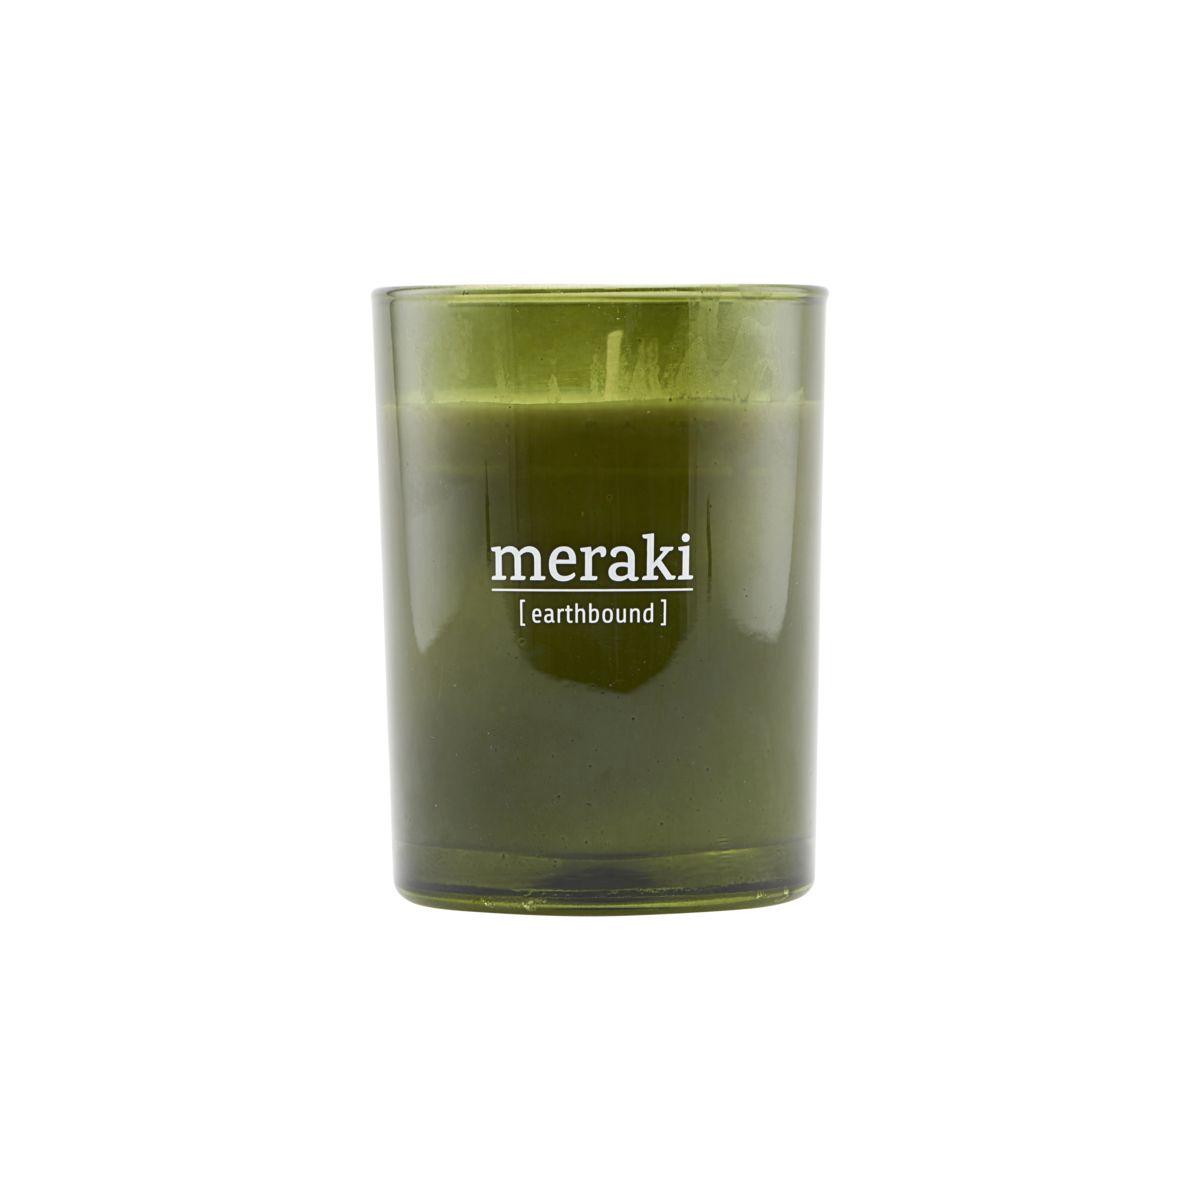 Meraki Earthbound Candle